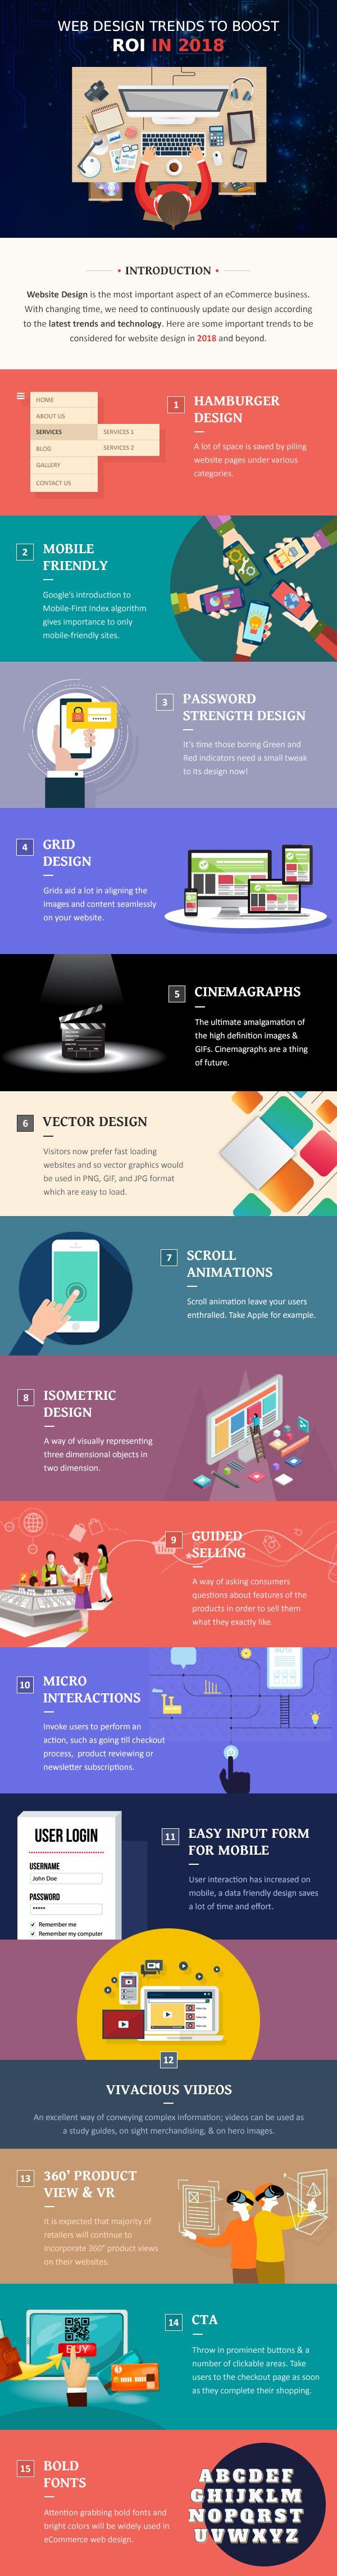 15 Web Design Trends For 2018 2019 Infographic Web Design Trends Web Development Design Web Design